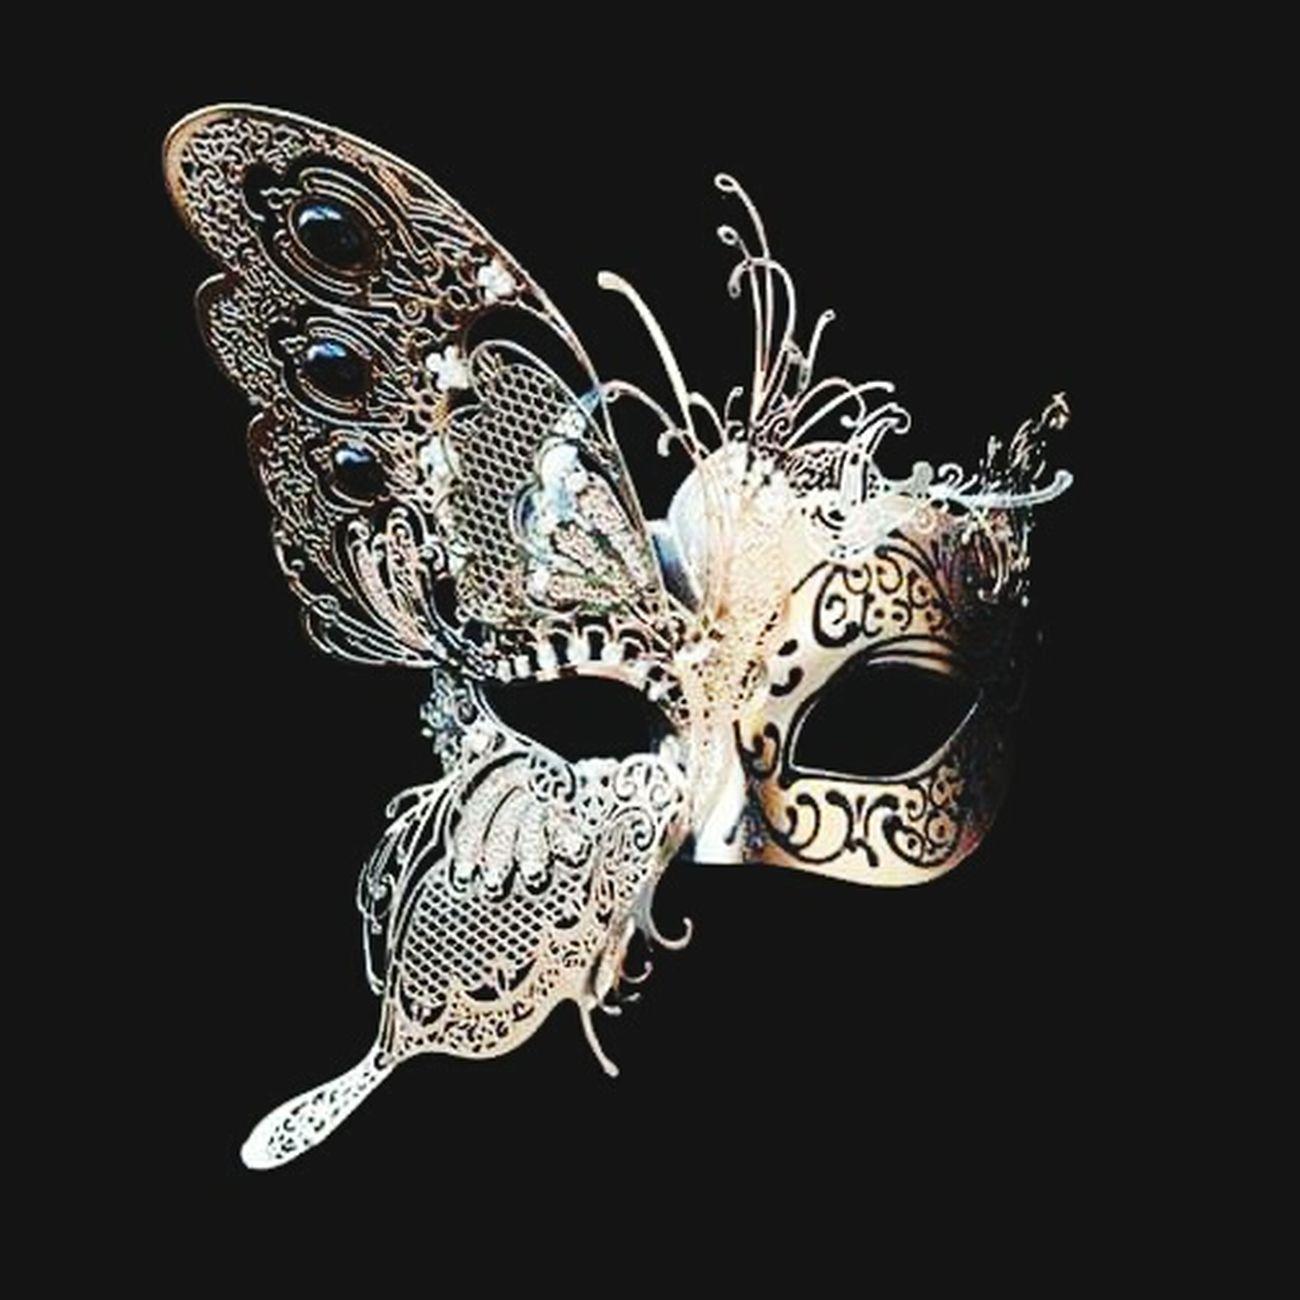 Venezia Venetian Mask Butterfly Butterfly Effect Venetian Impressions Italia Italian Art Metal Art Ornaments History Historycal History And Culture Ball Femininity Girly Ornamental Prestige Aristocats Seductiveart